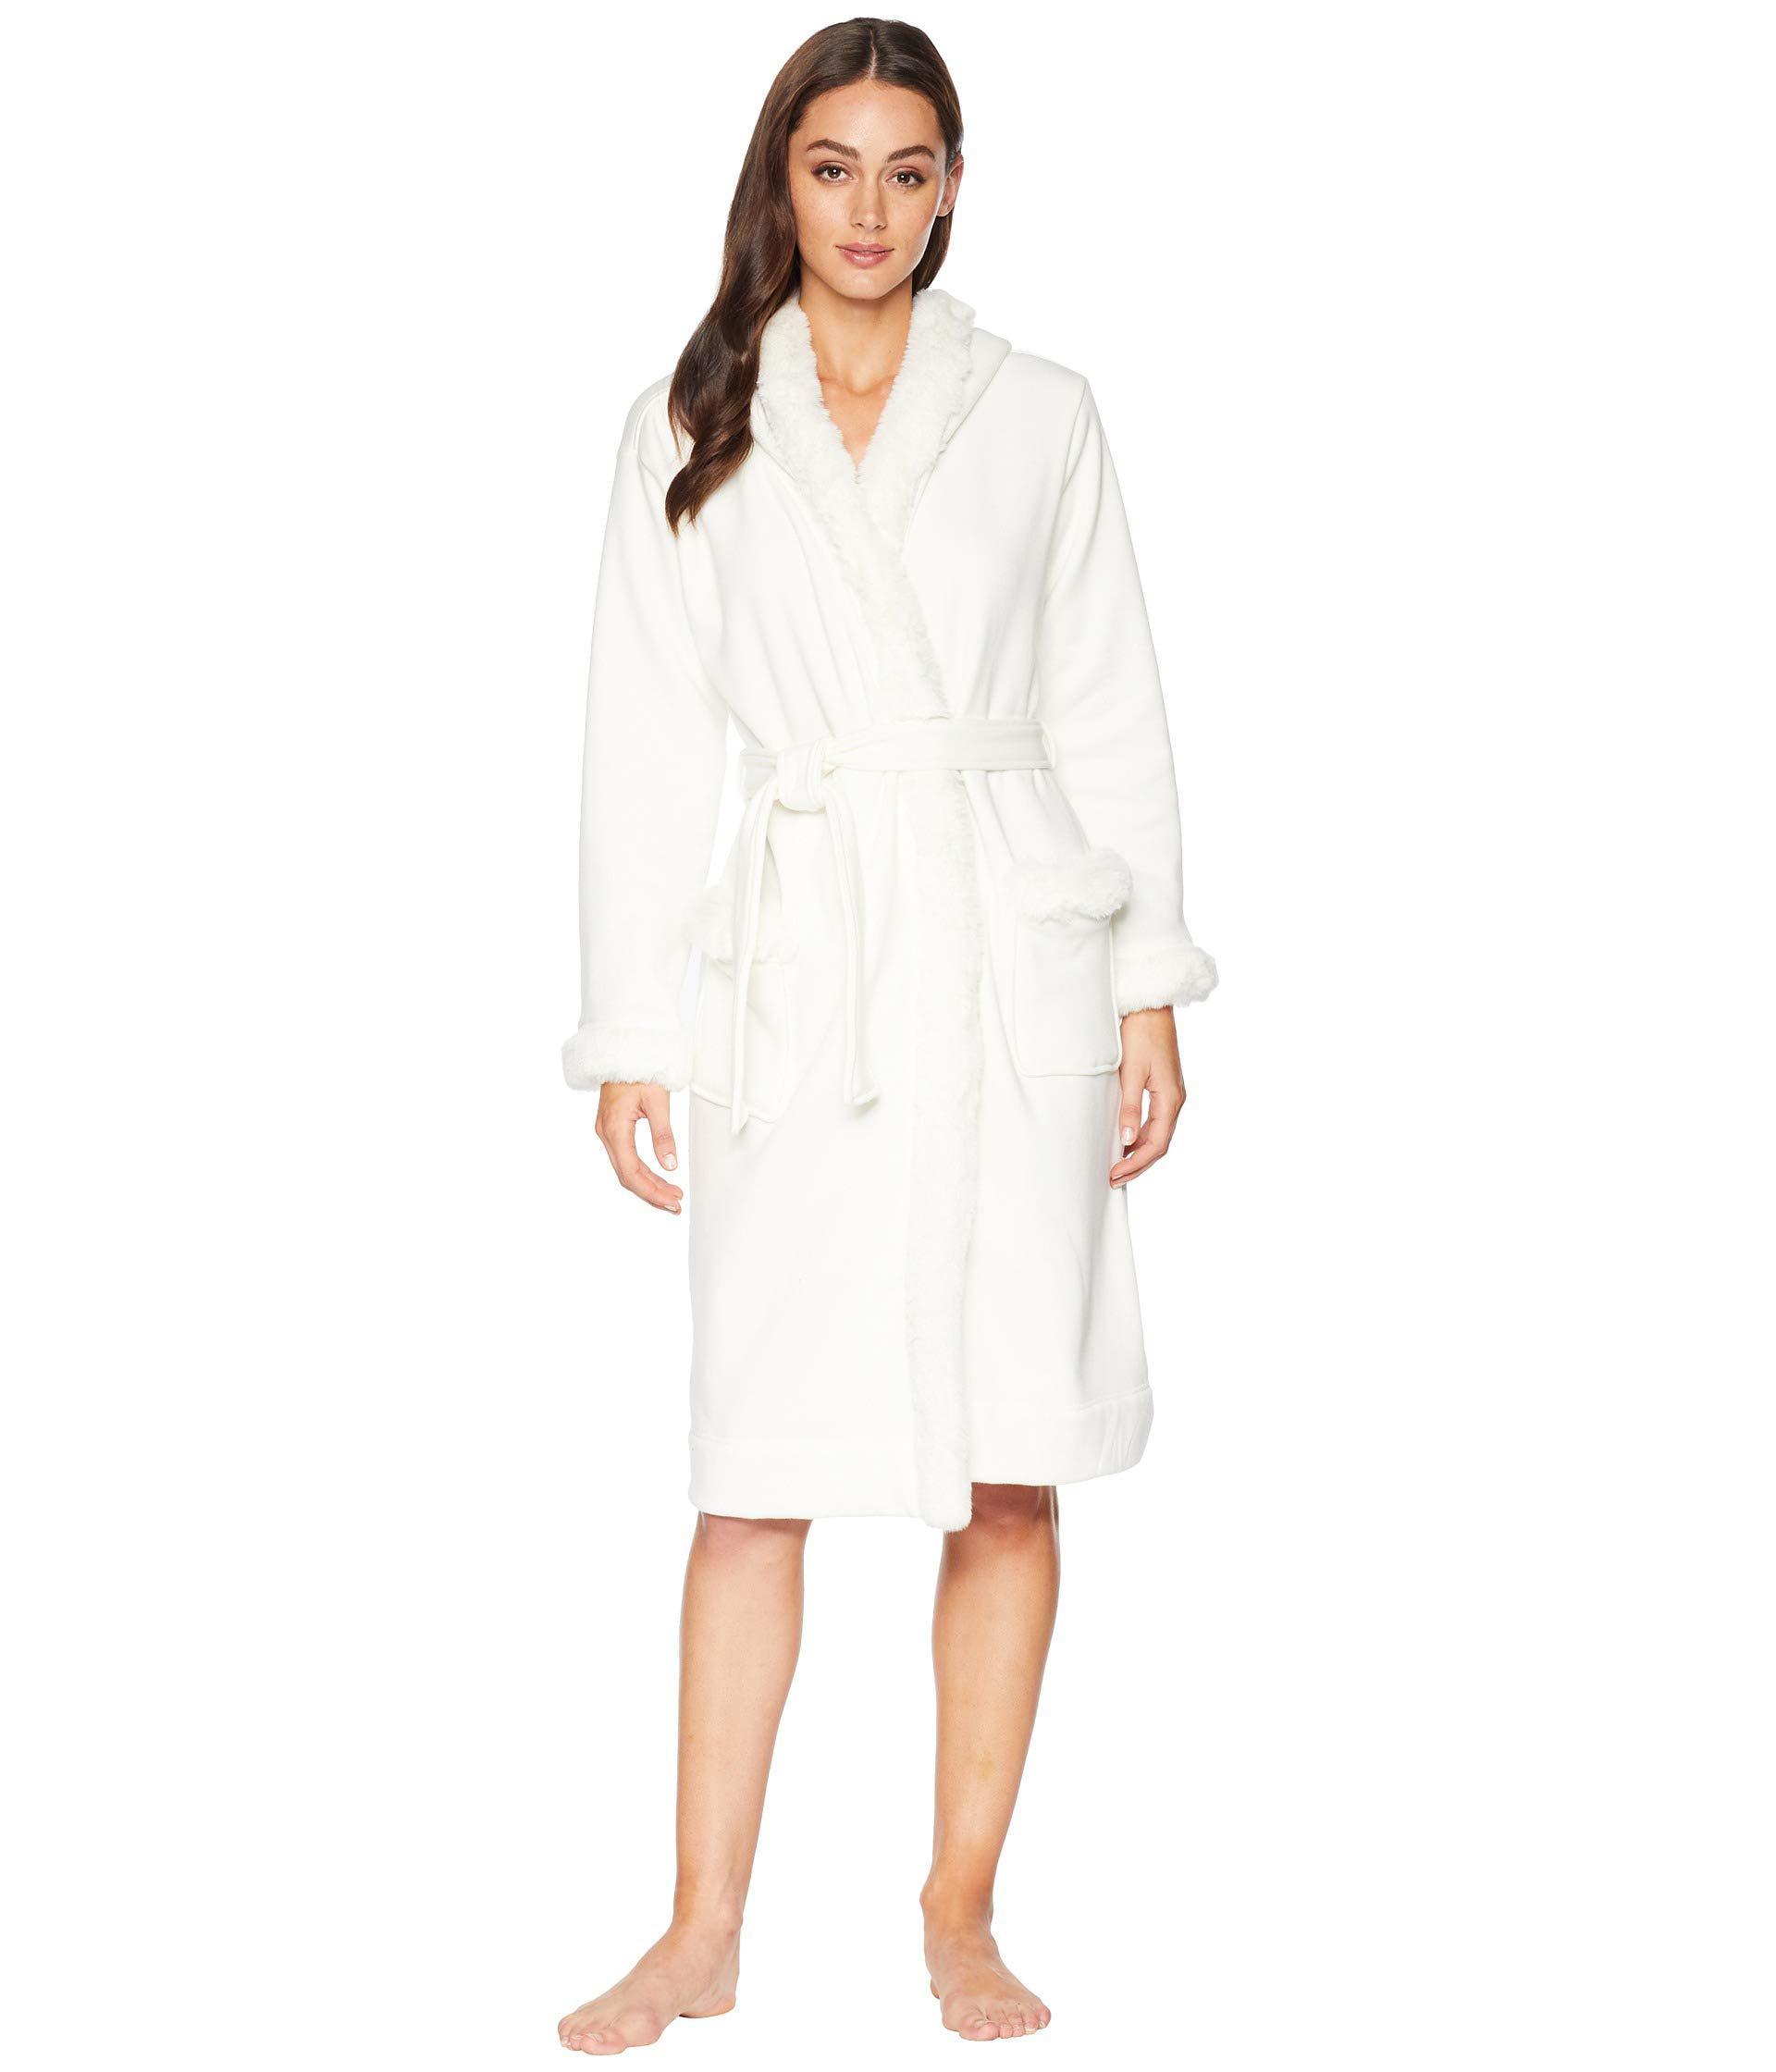 8c36e547ef7 White Duffield Deluxe Ii Robe (black) Women's Robe